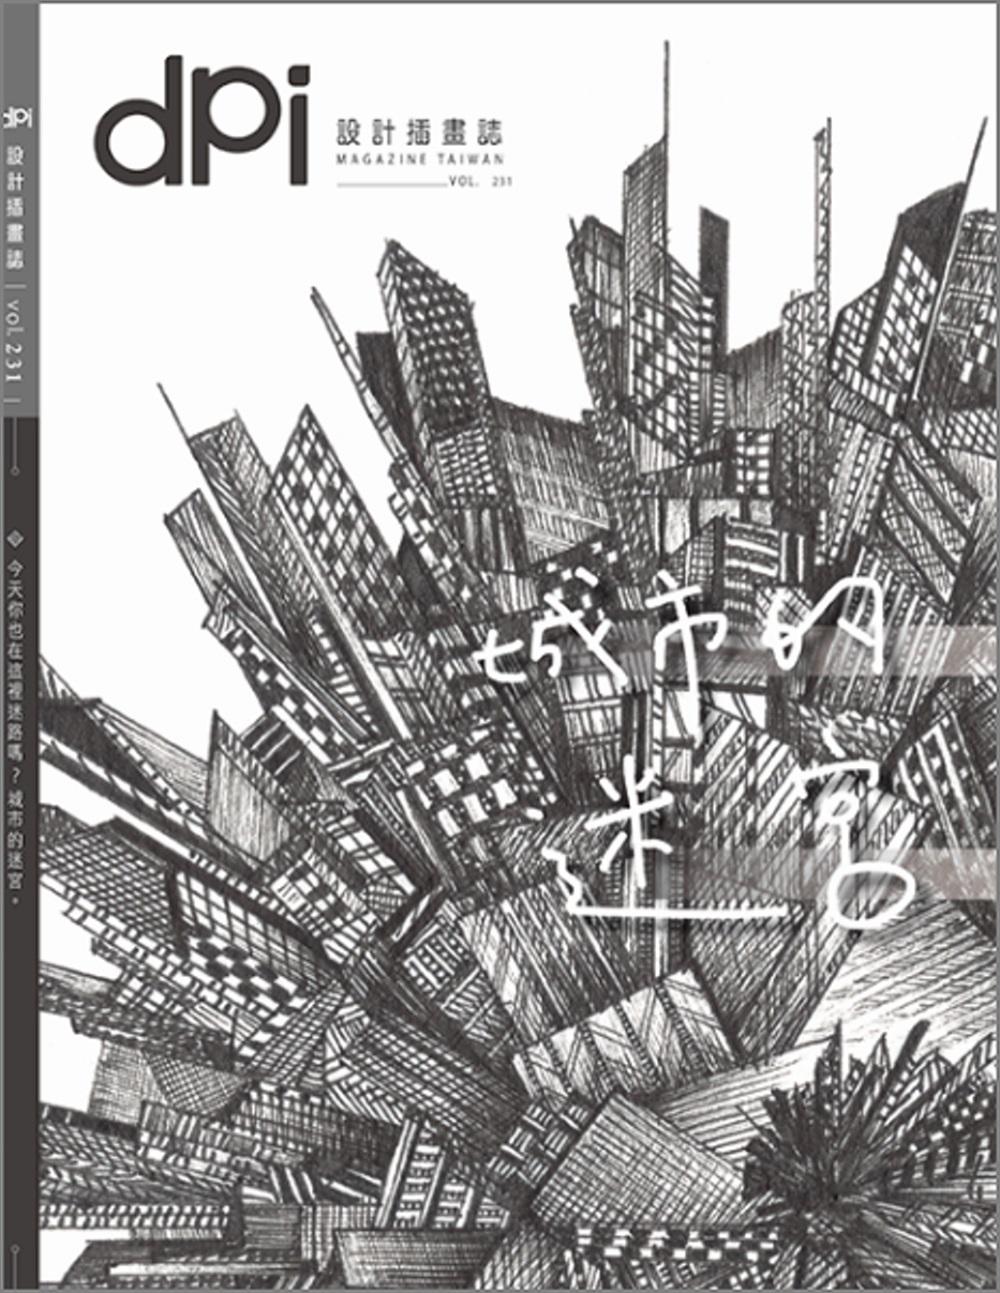 dpi設計插畫誌 7月號/2018 第231期|Boom Boom BROSMIND 就要發射太空彈 展覽門票1張